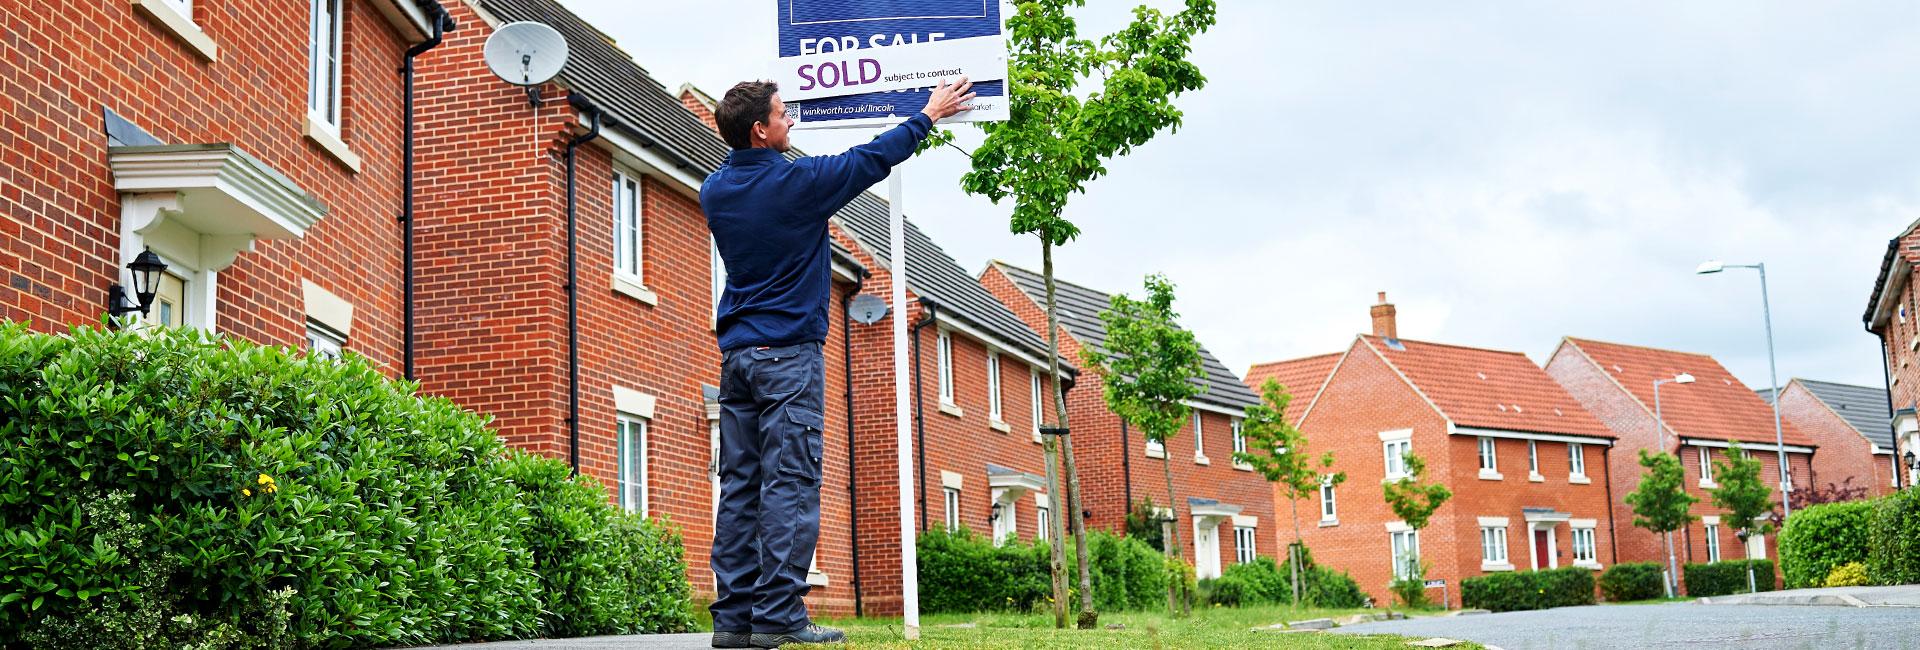 Sold Properties - Property Activity Index data